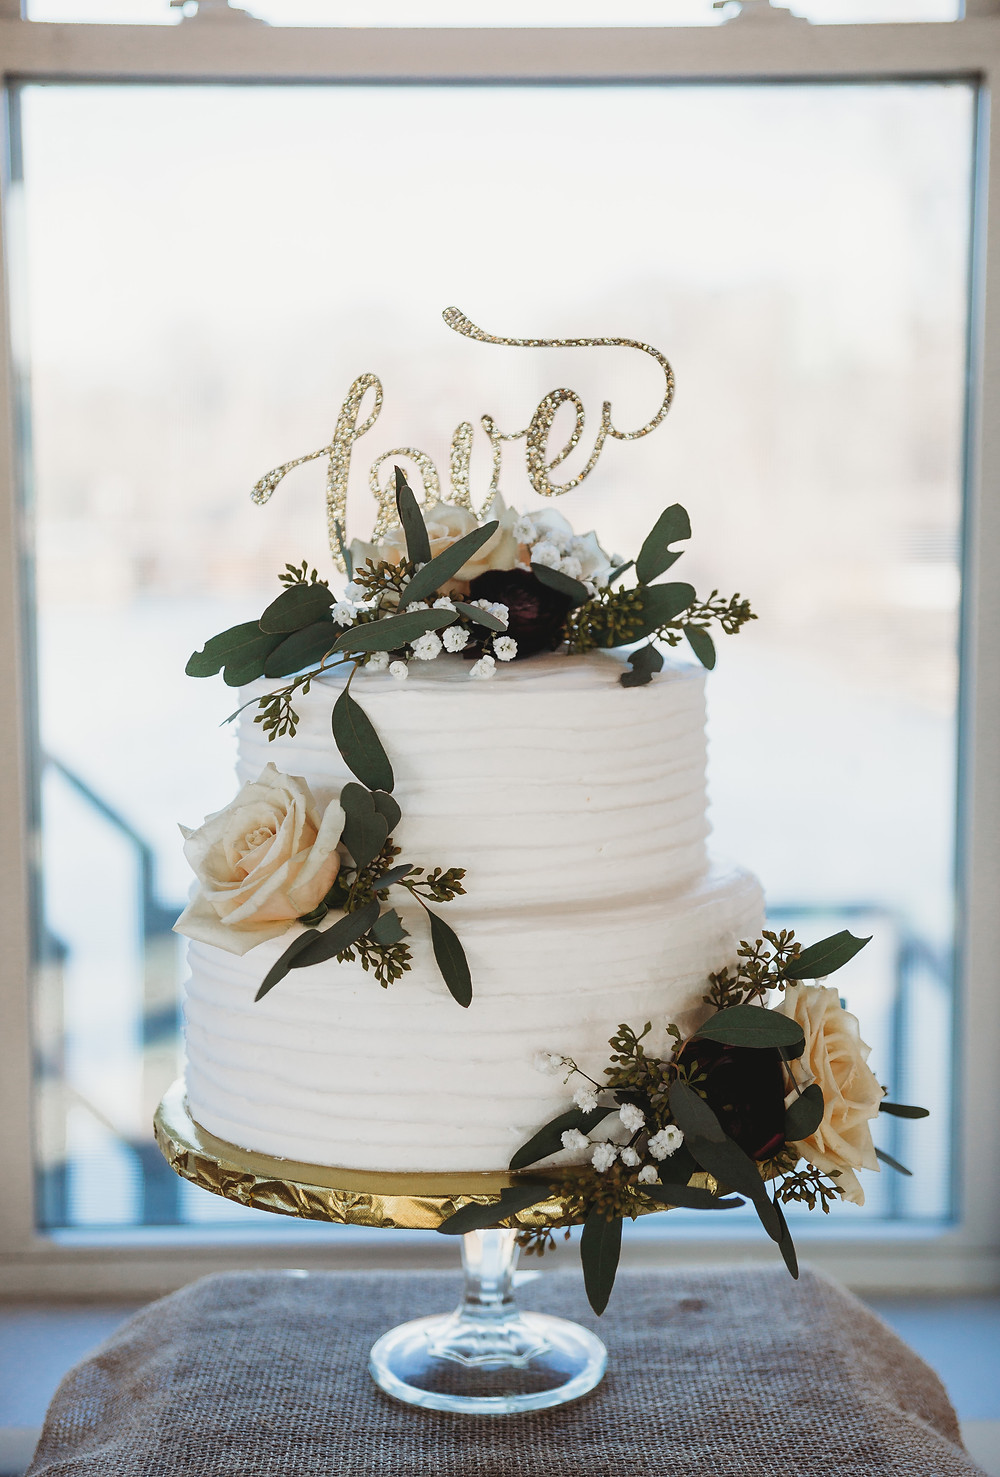 simple simon bakery wedding cake